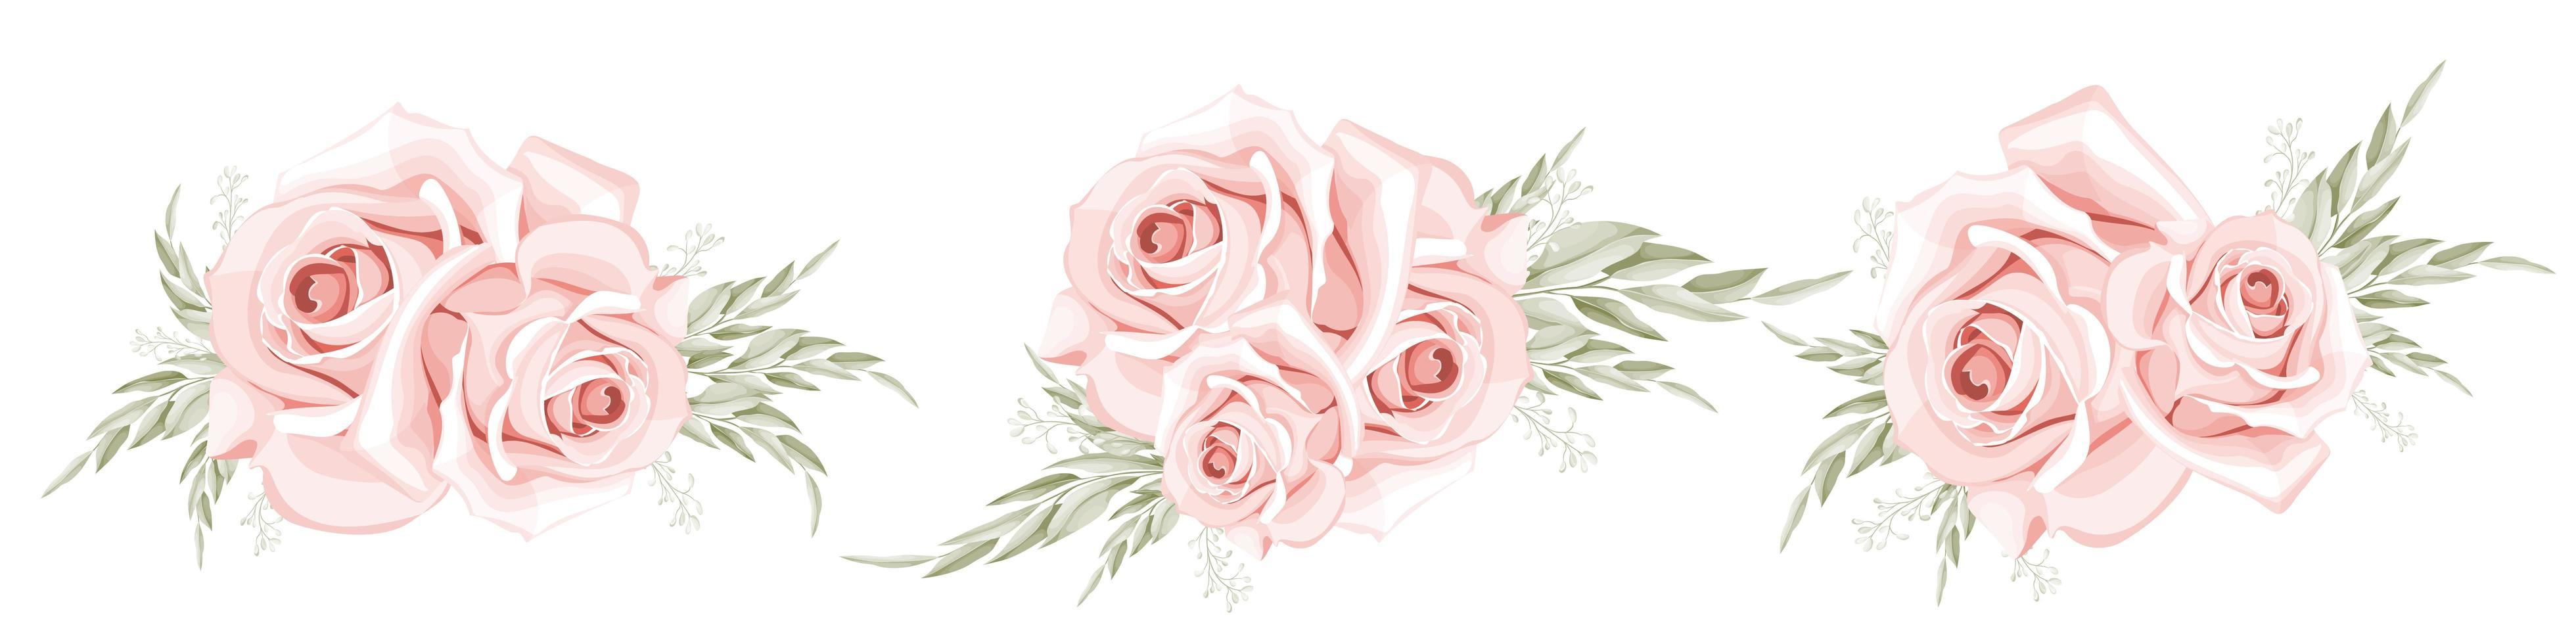 aquarel roos boeket set vector